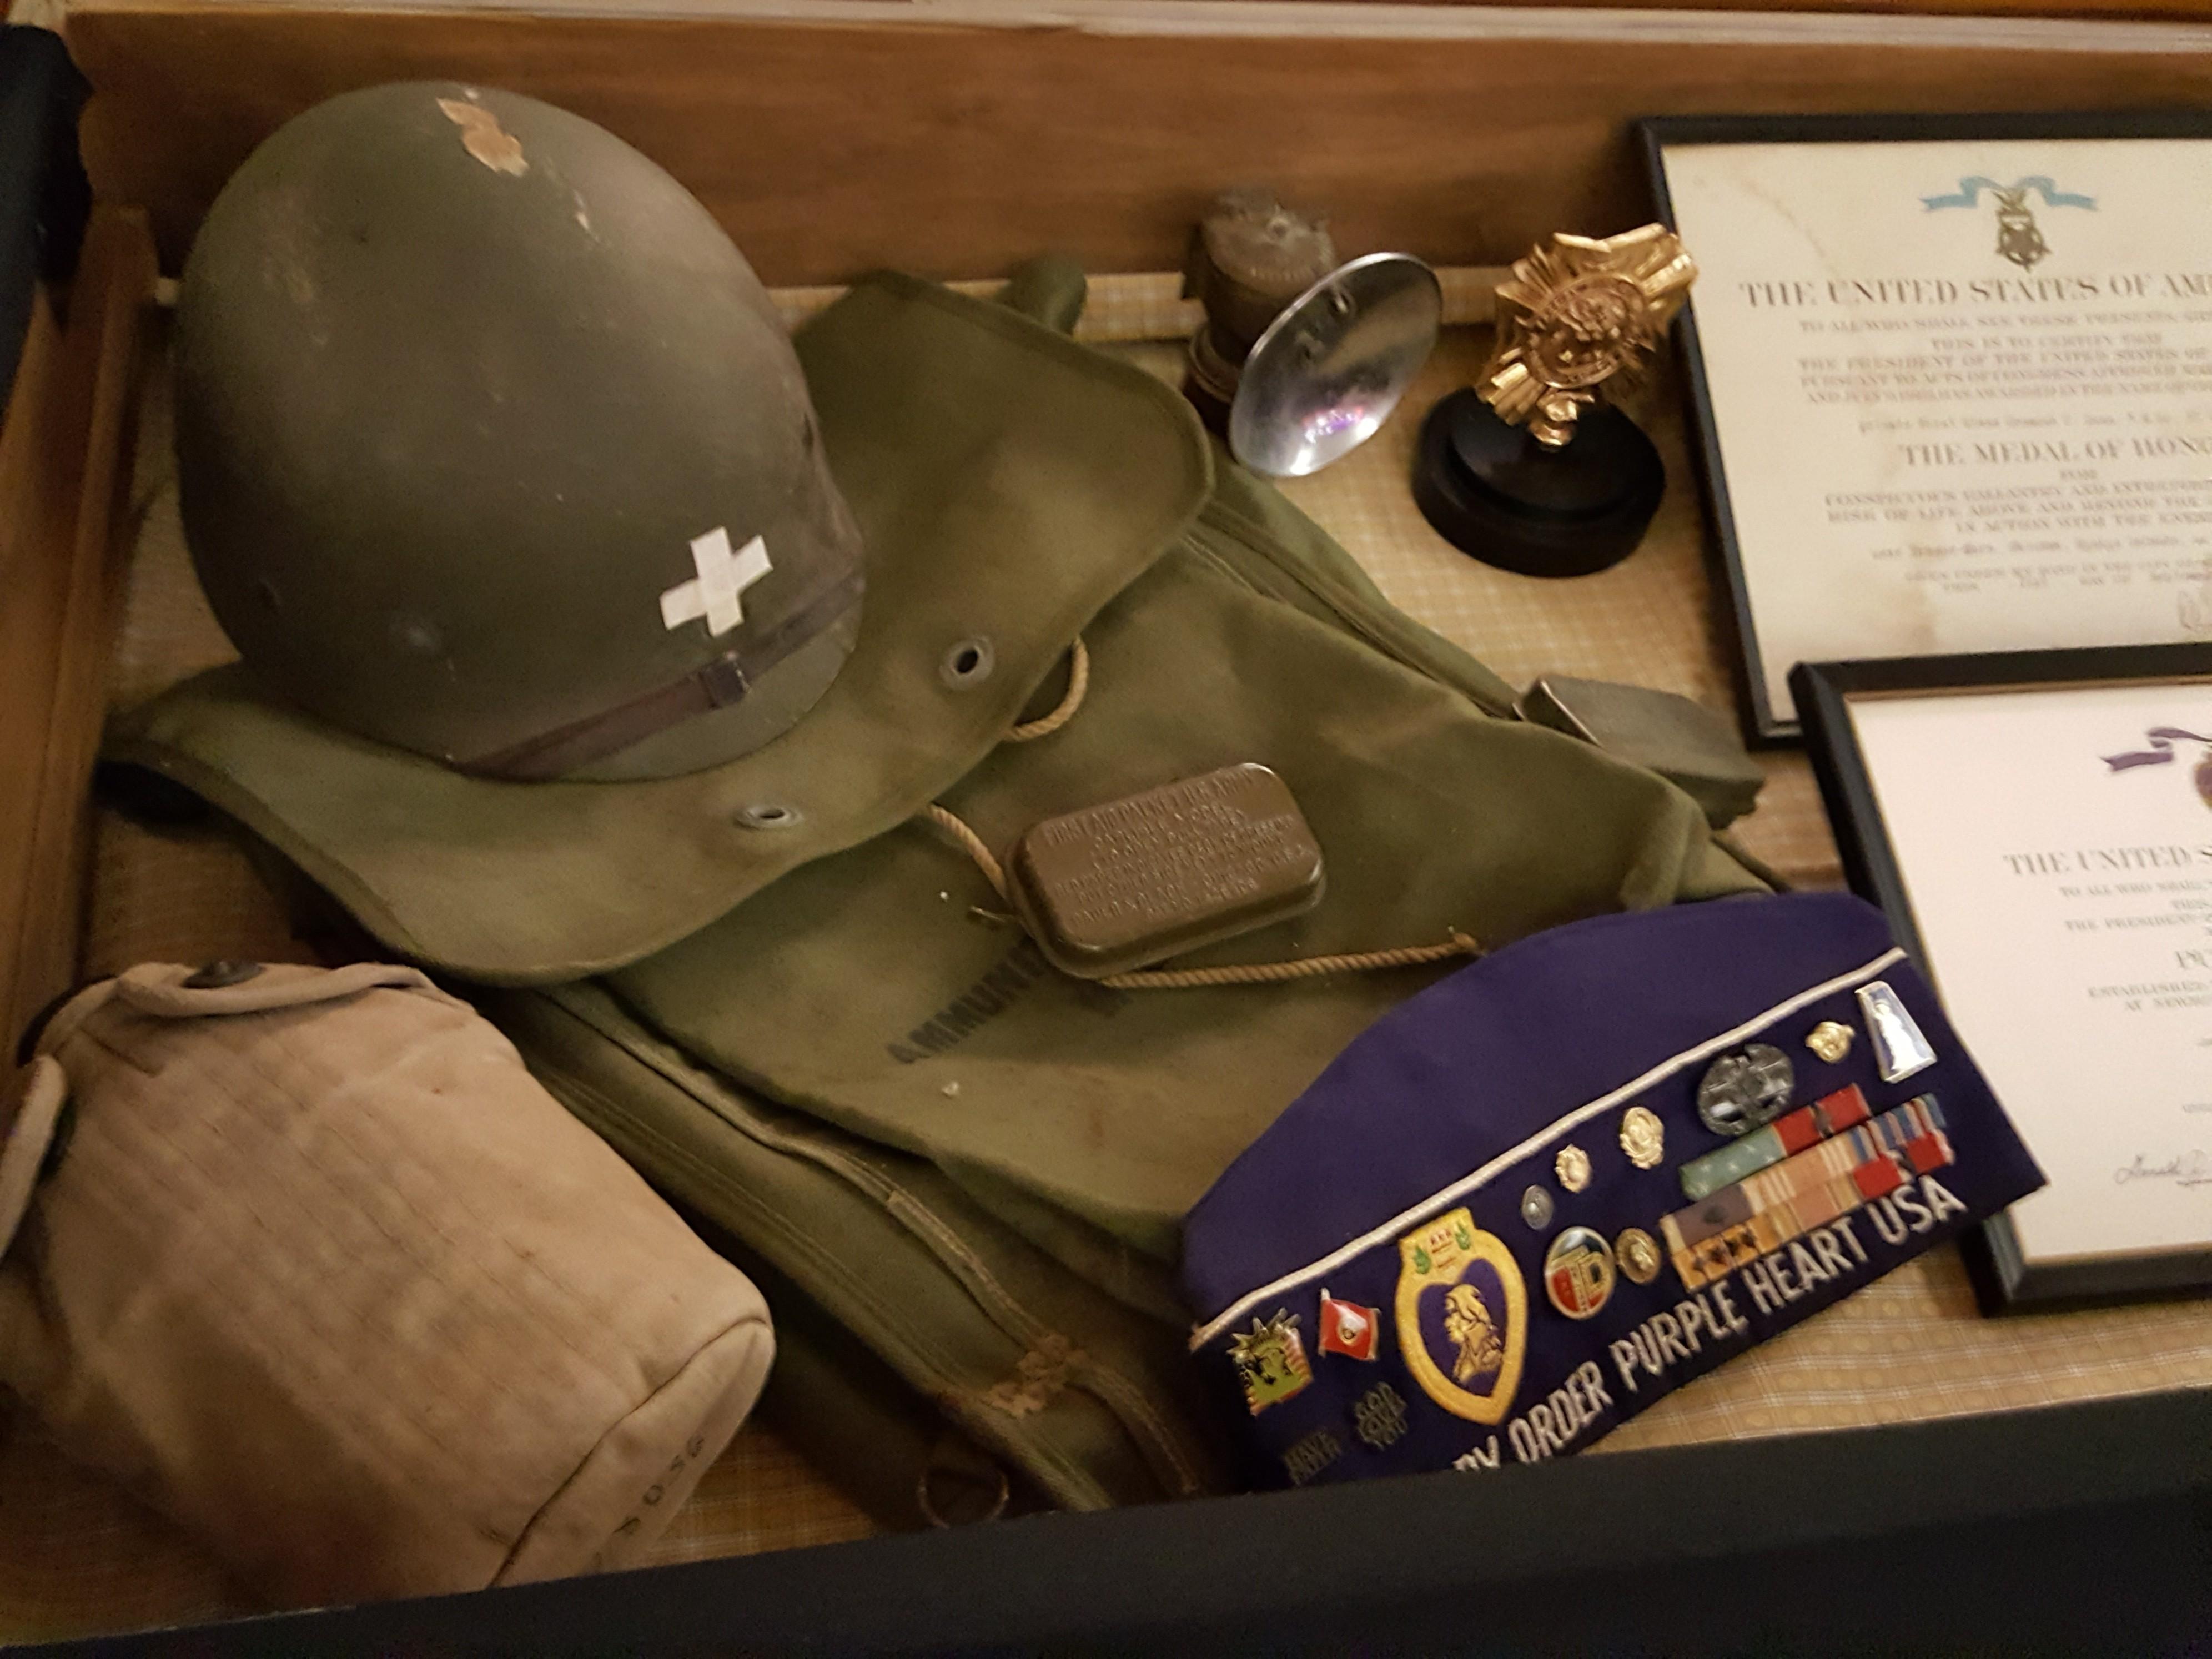 Helmet, knapsack and canteen of Desmond Doss